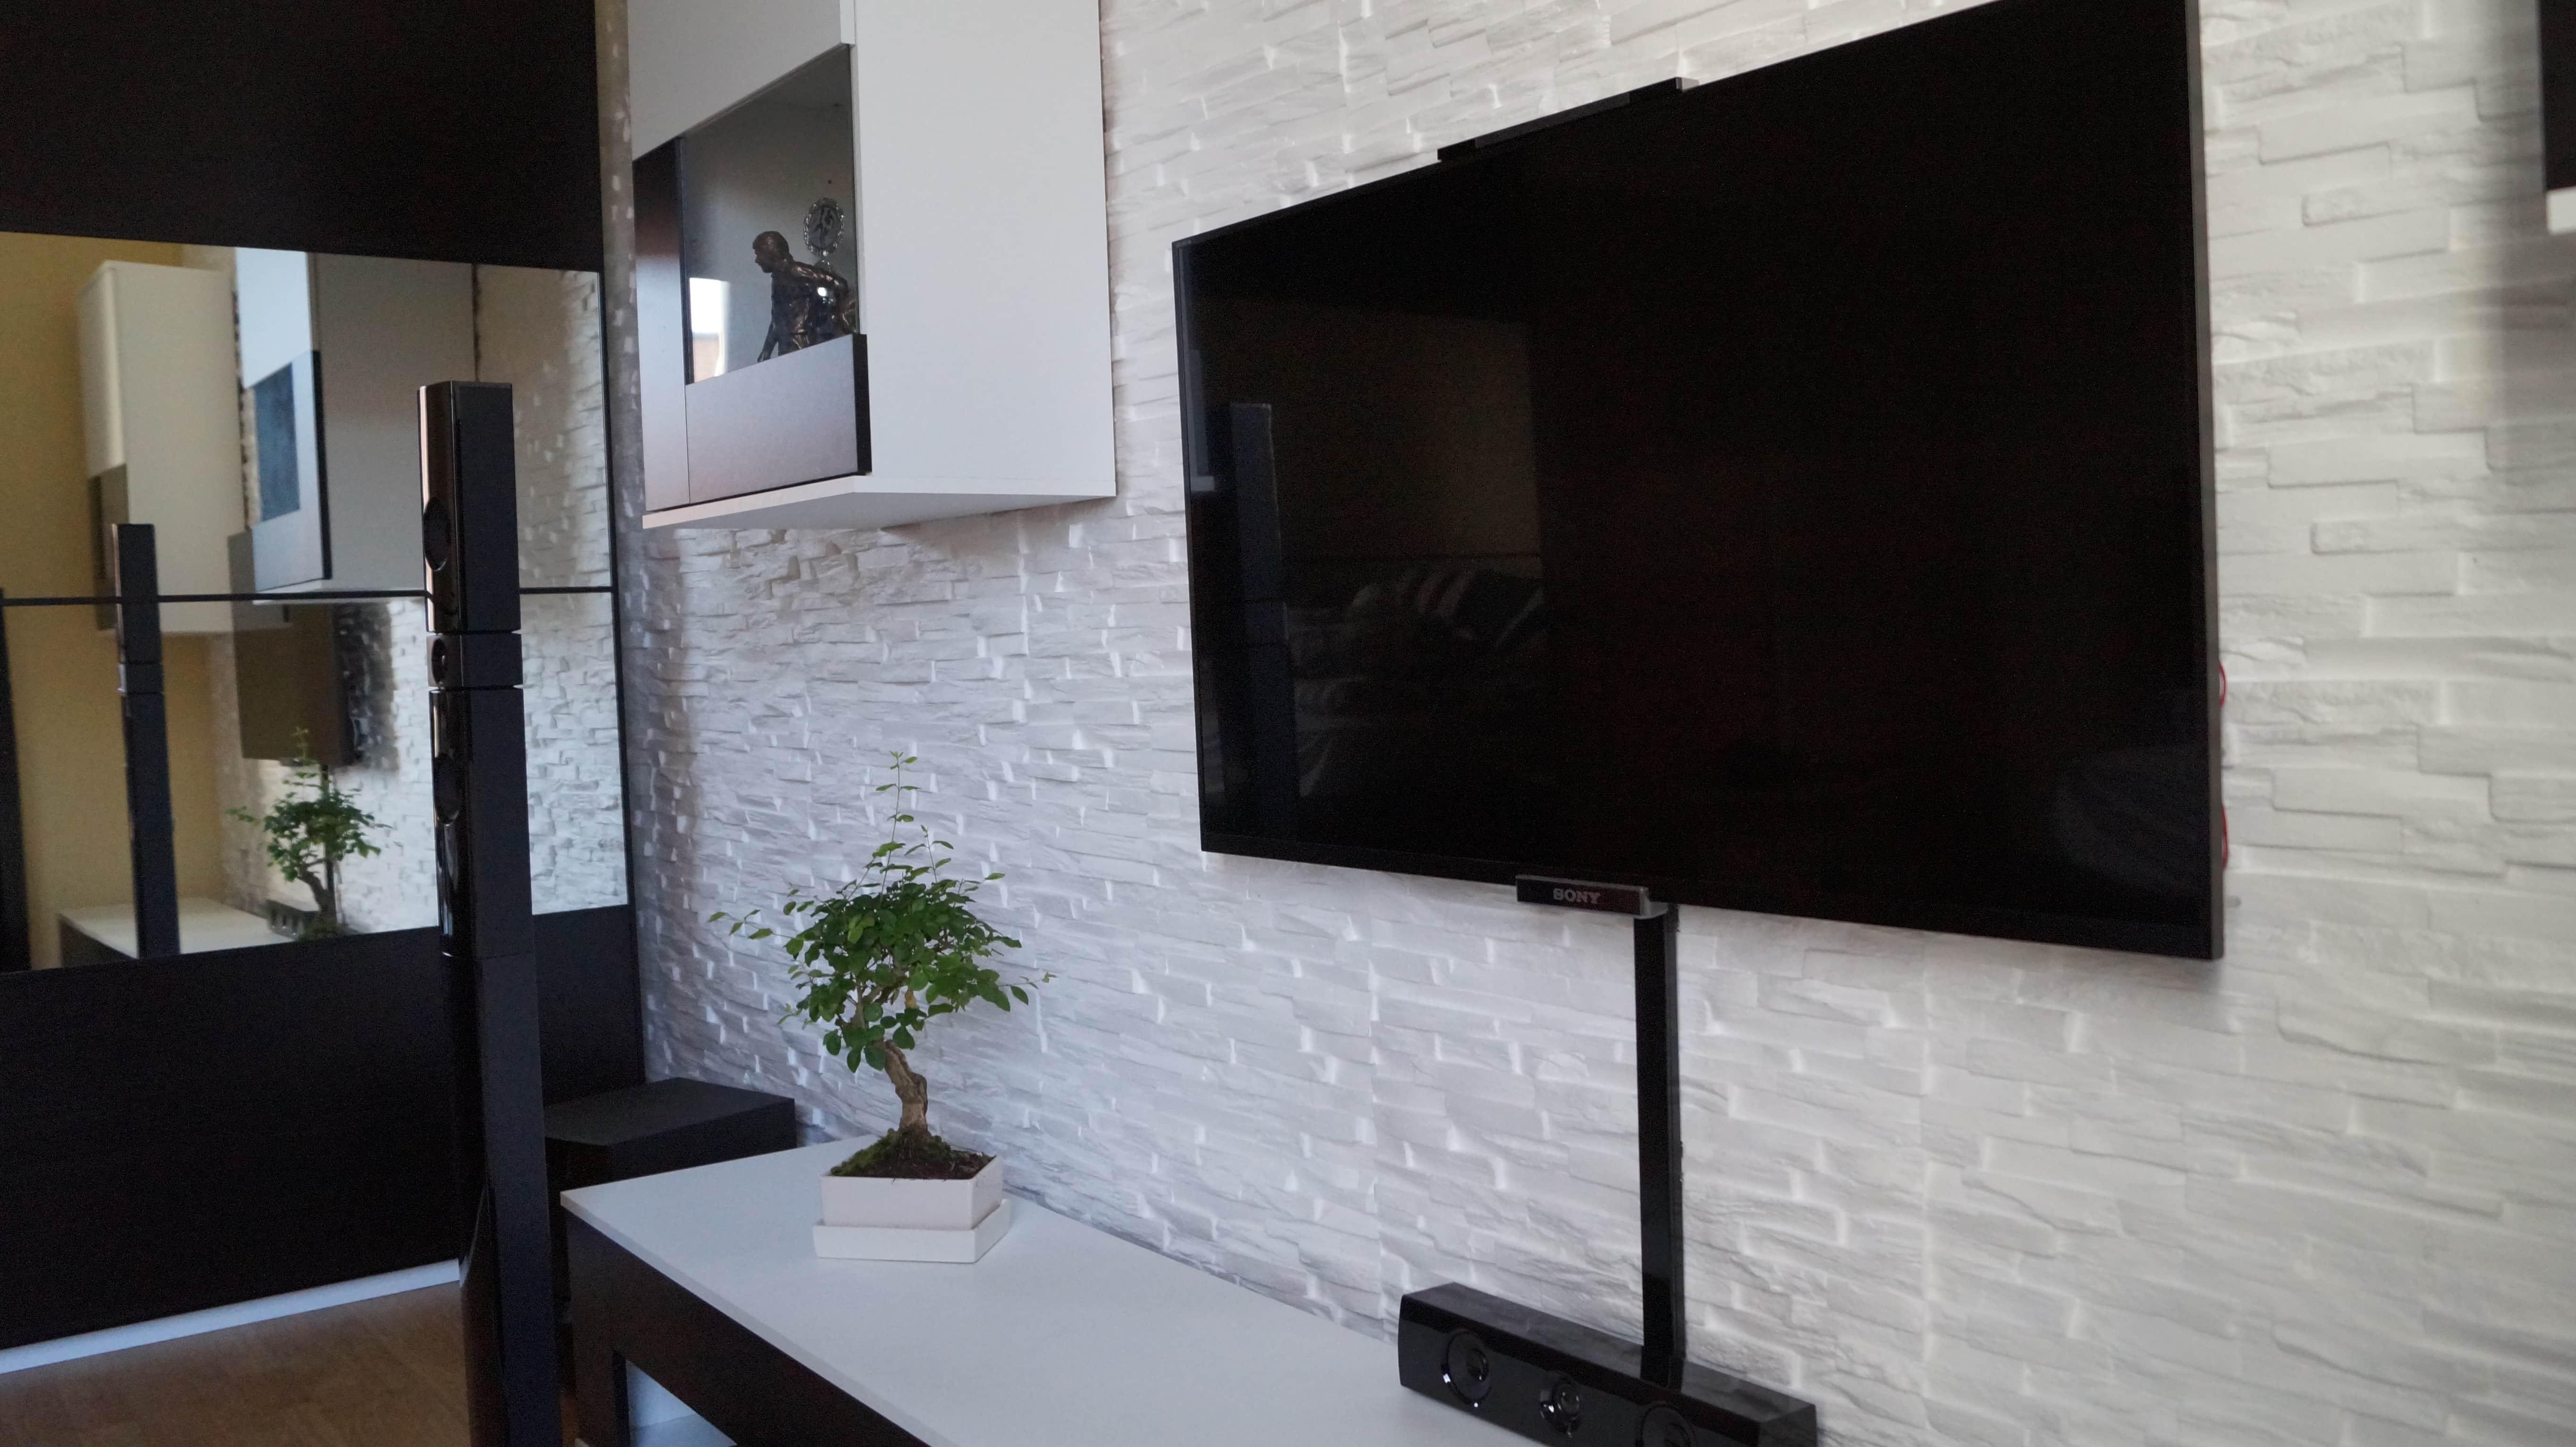 rebel of styles ultralight benevento im test ps4source. Black Bedroom Furniture Sets. Home Design Ideas